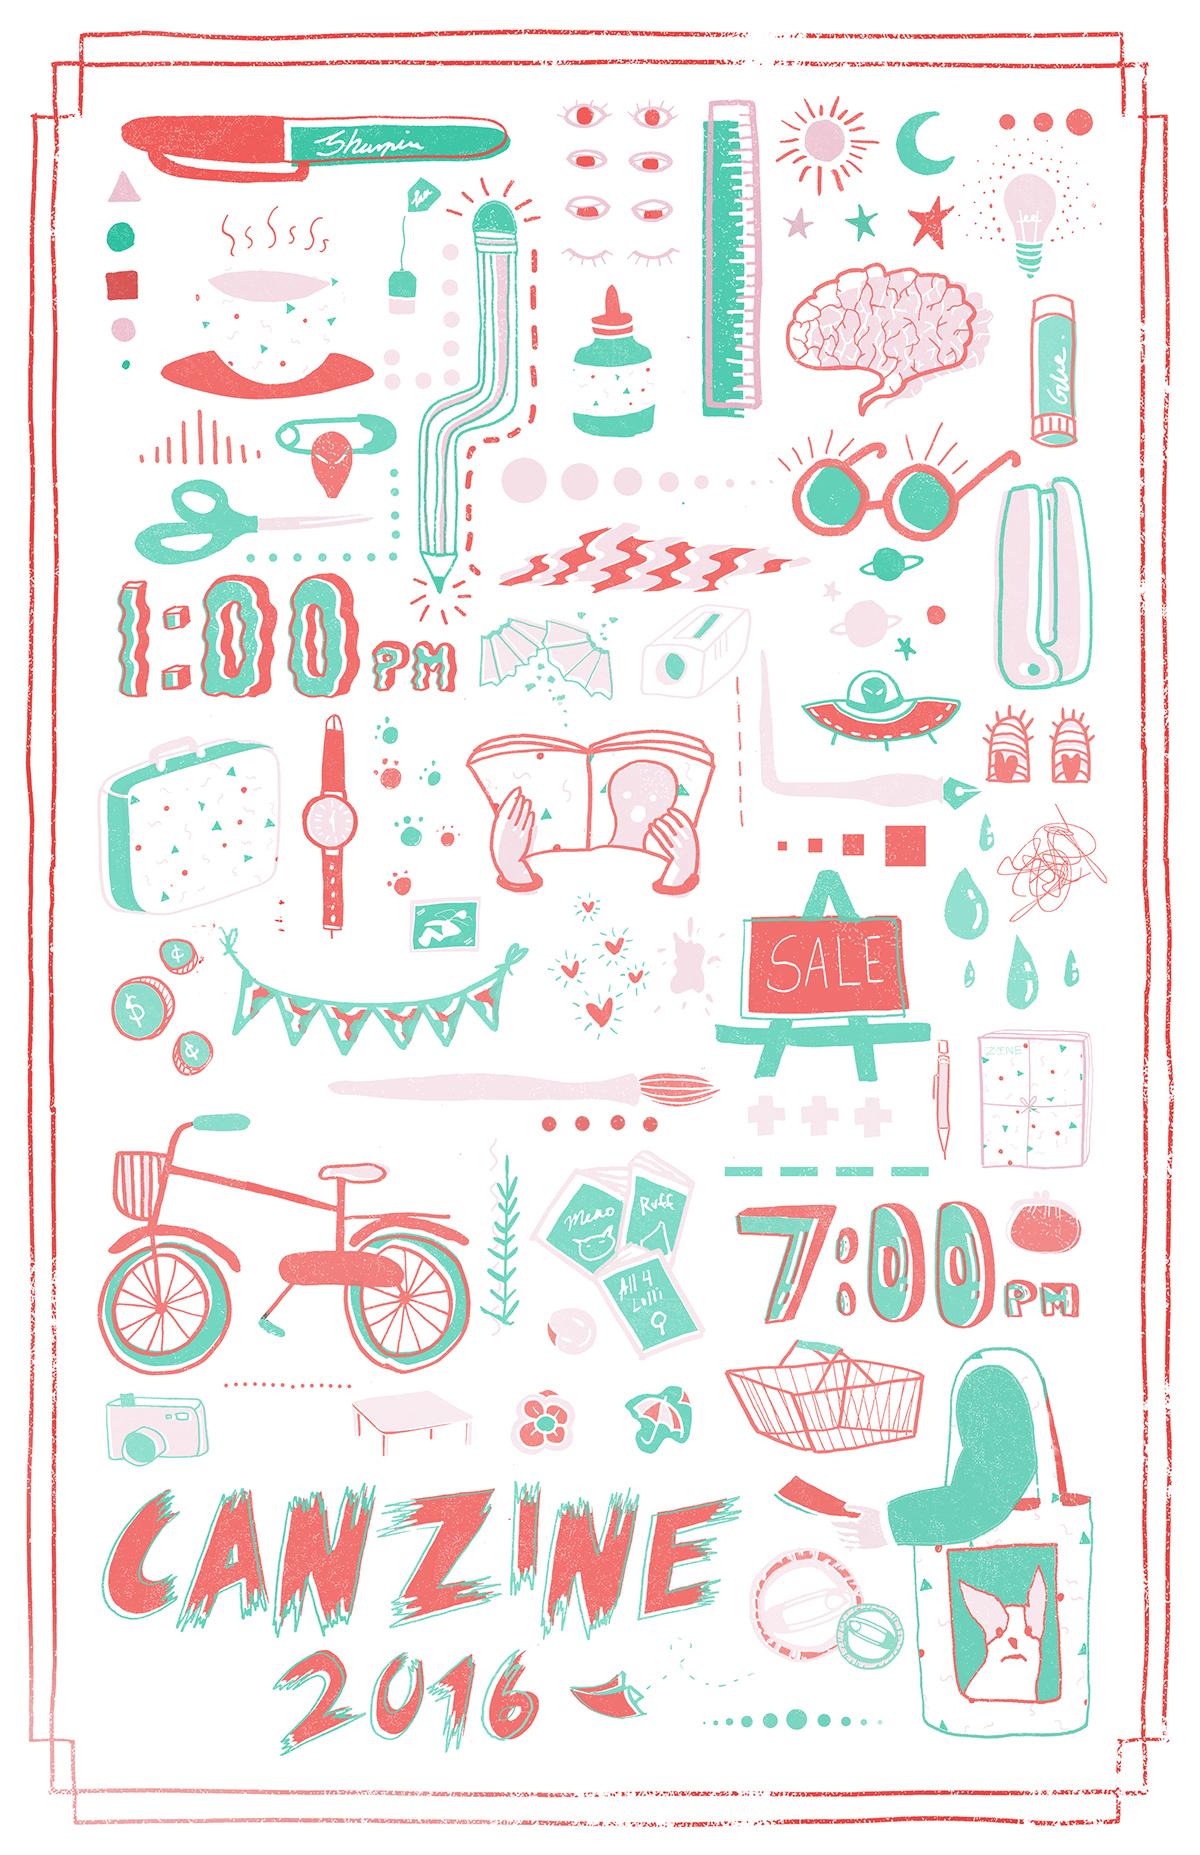 Canzine 2016 Poster